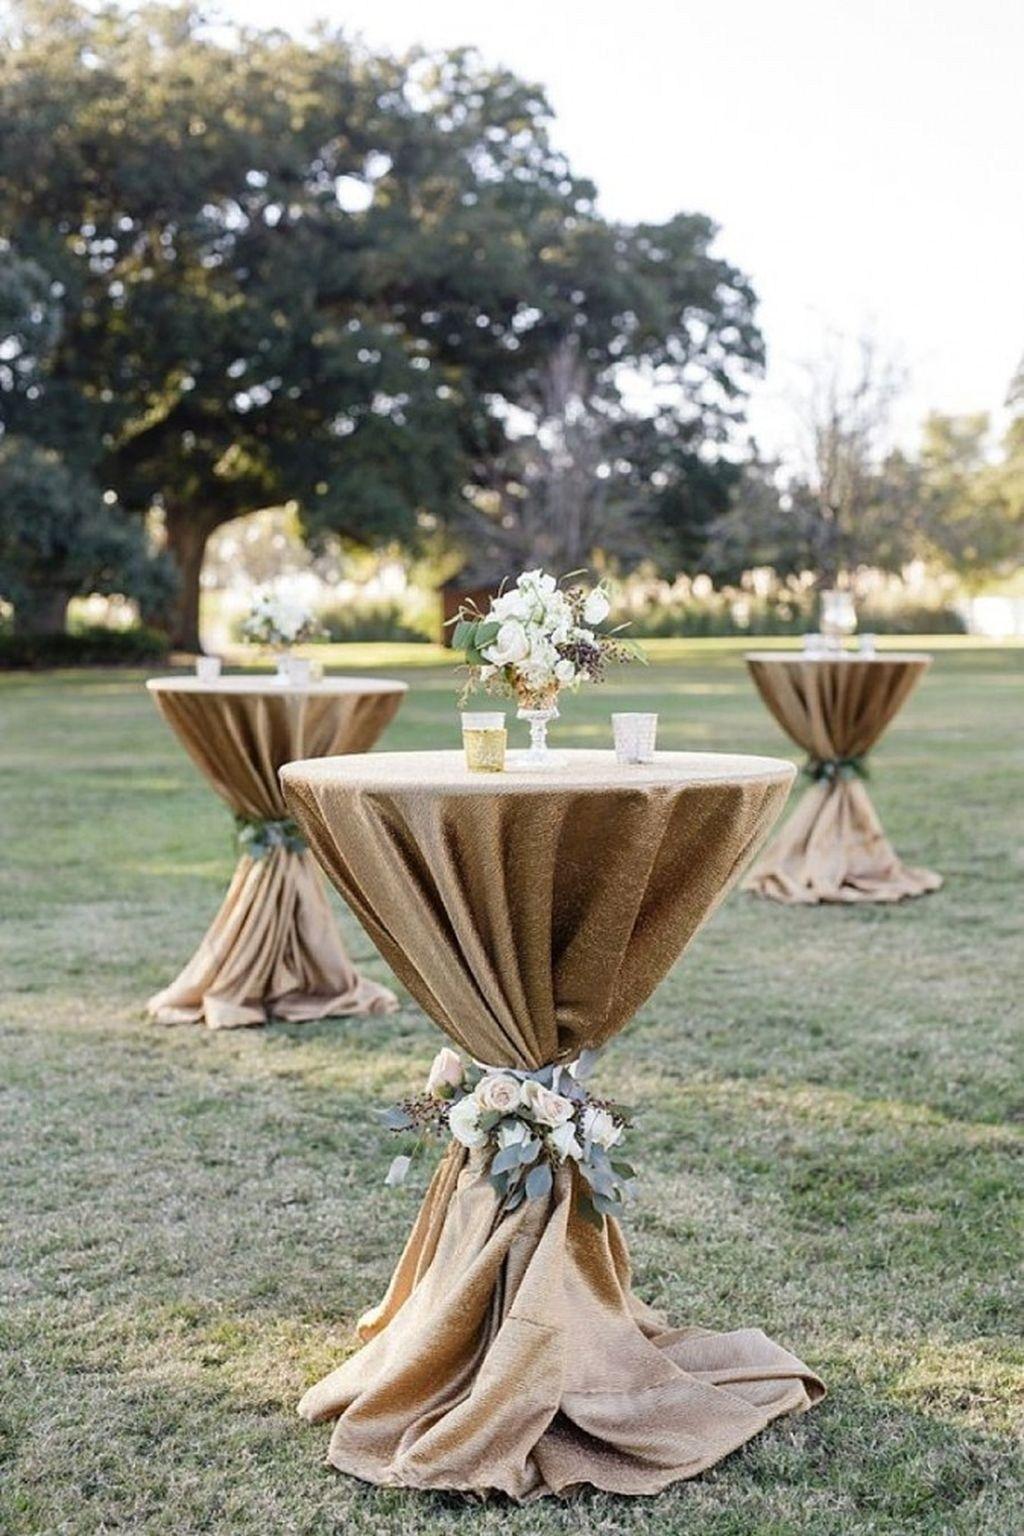 Outdoor wedding decoration ideas cheap  Romantic Outdoor Wedding Decor Ideas For Your Special Day